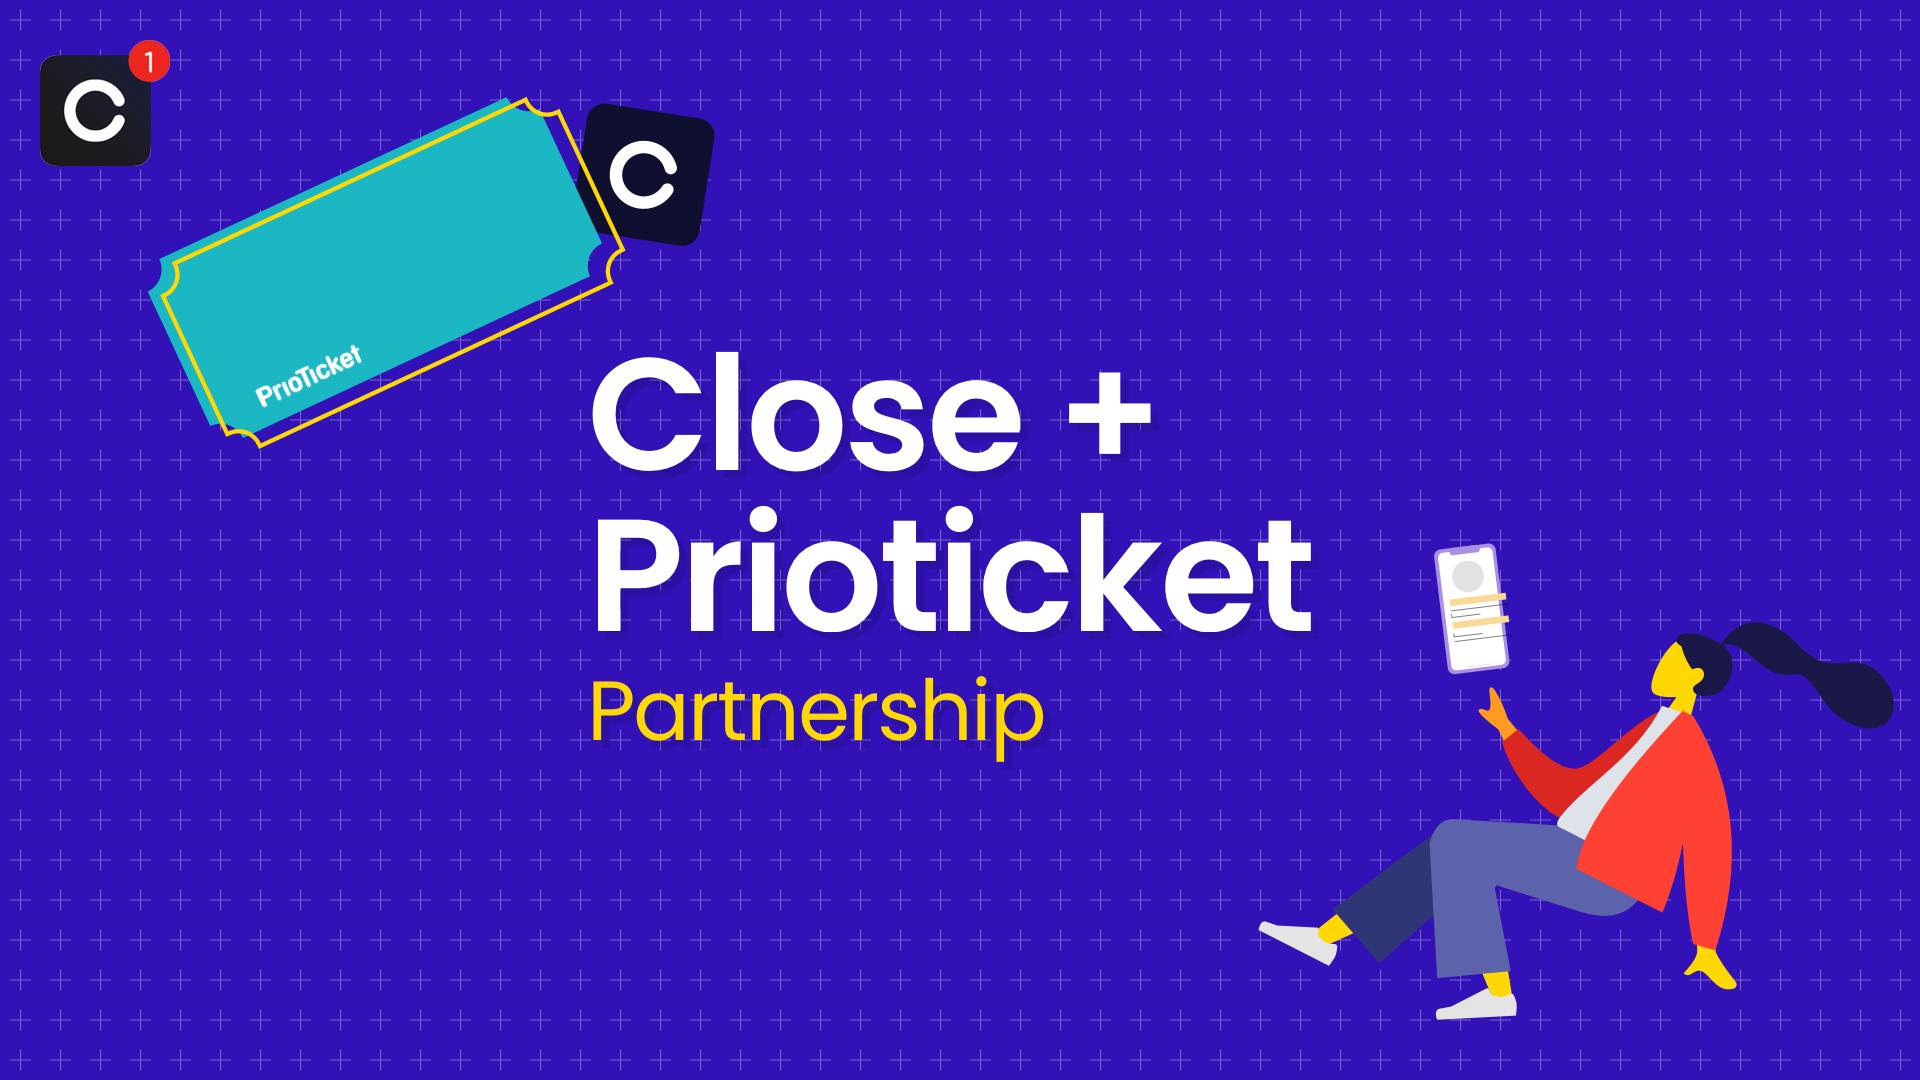 Partnership: Close + Prioticket